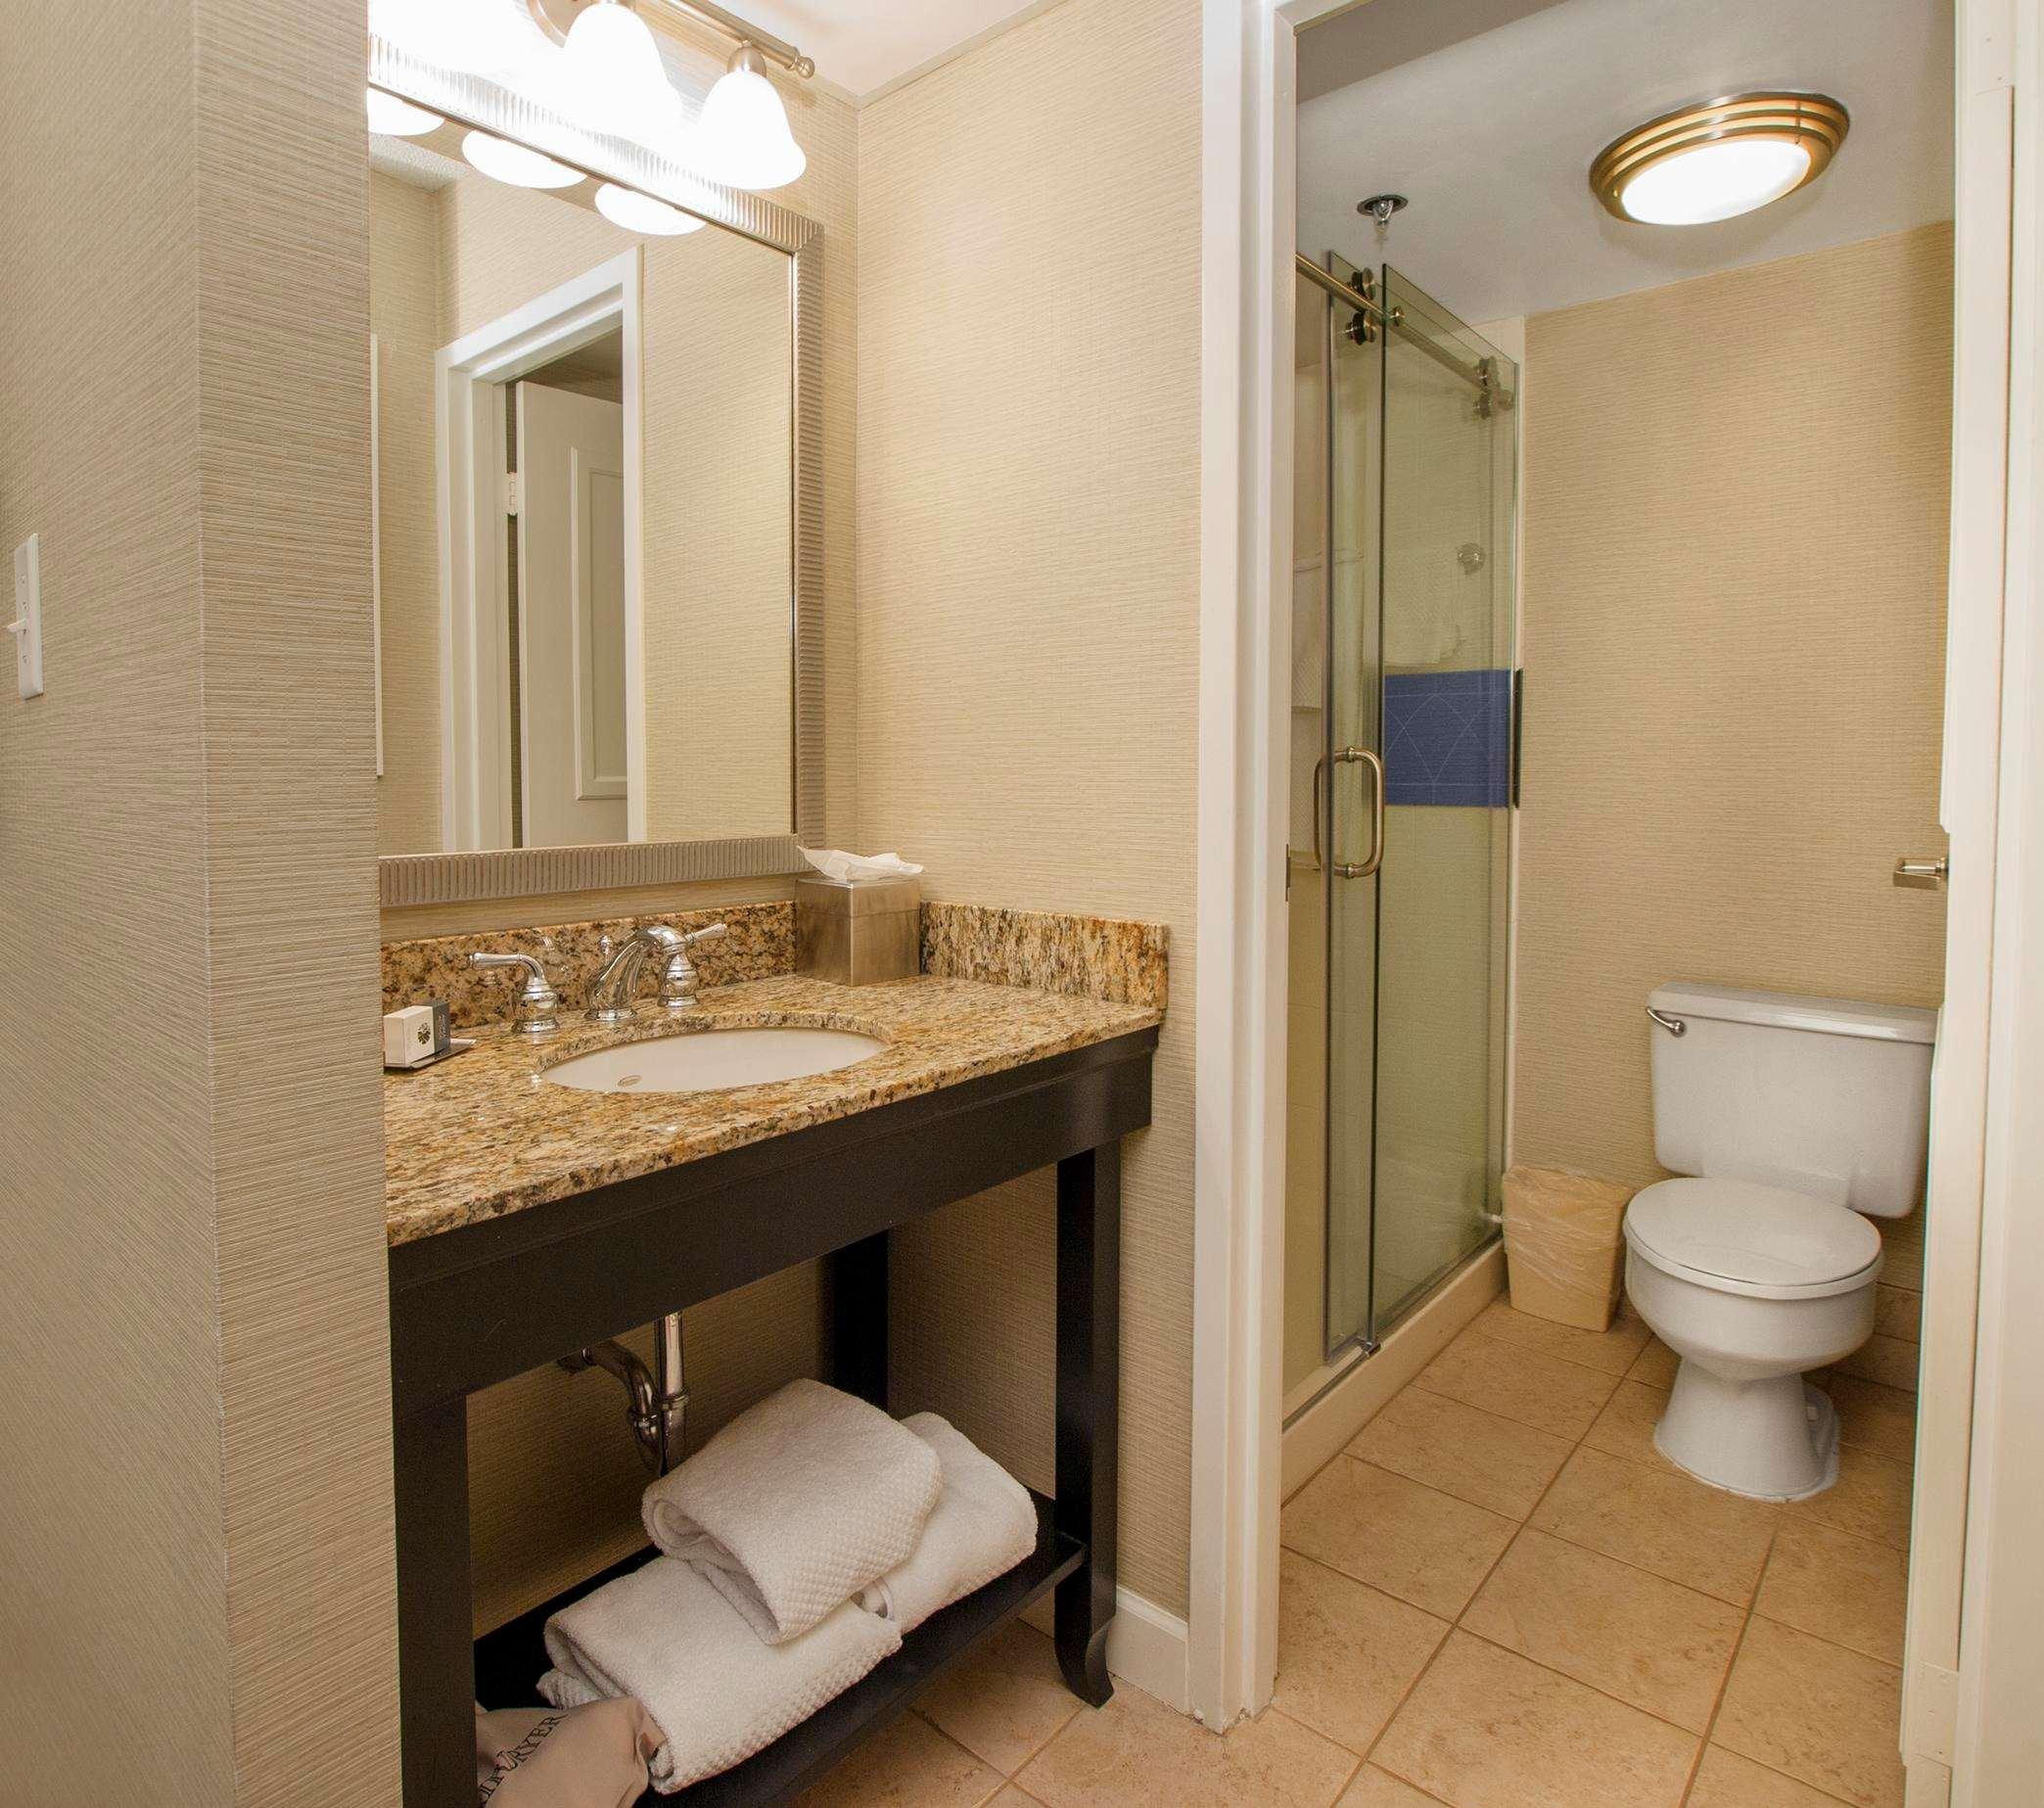 DoubleTree by Hilton Hotel Buffalo - Amherst image 20